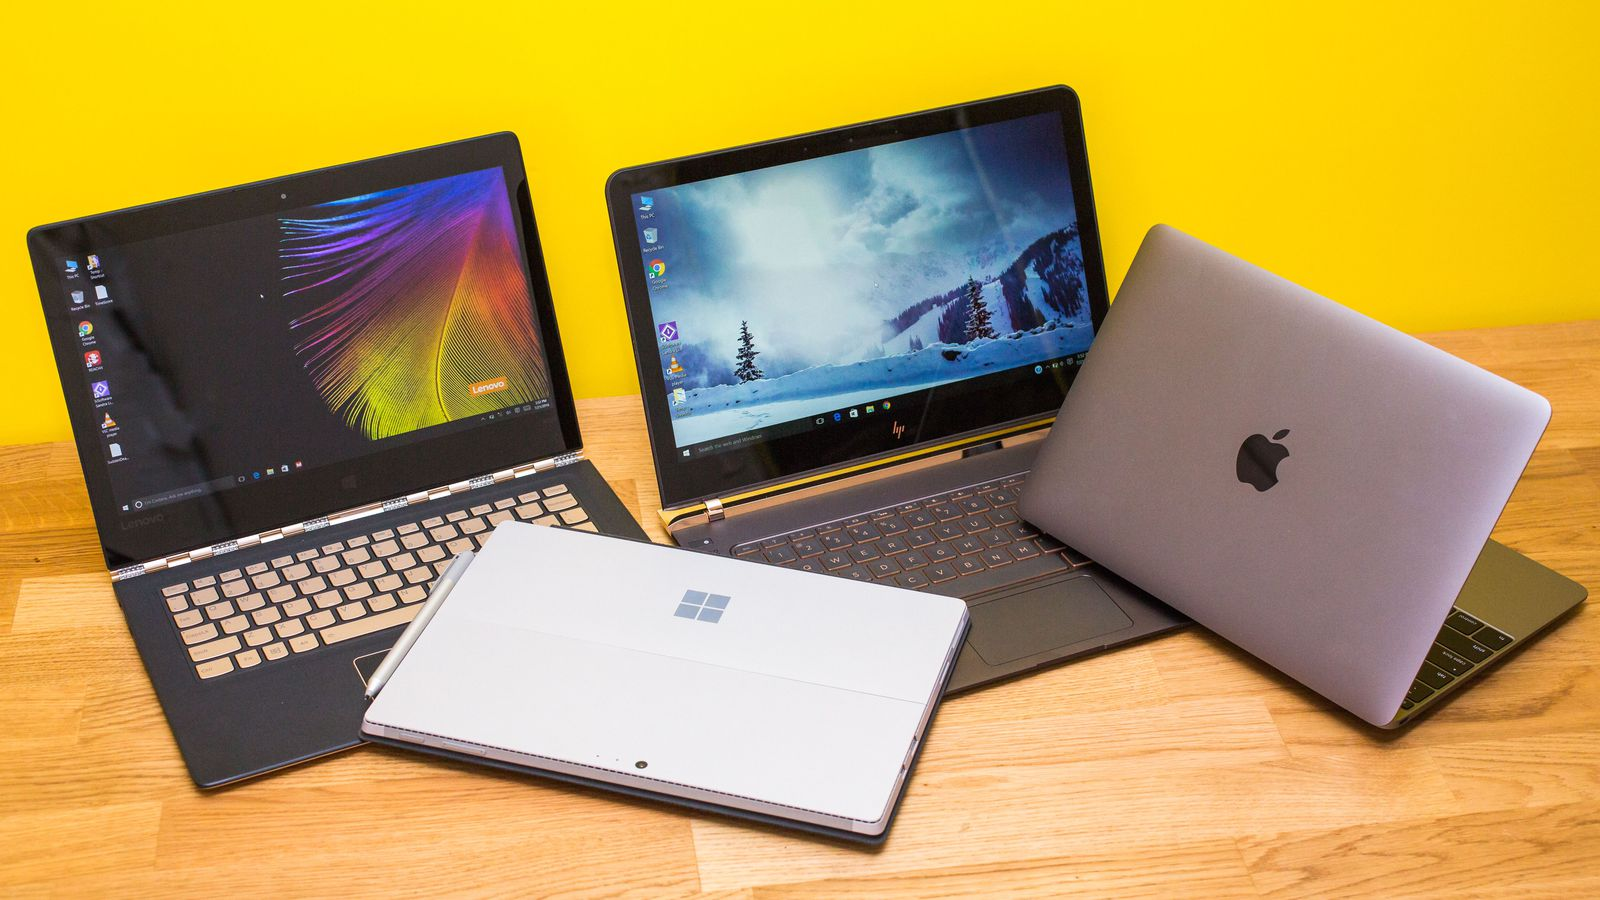 Goi-y-cach-mua-laptop-cu-uy-tin-chat-luong-tai-ha-noi2